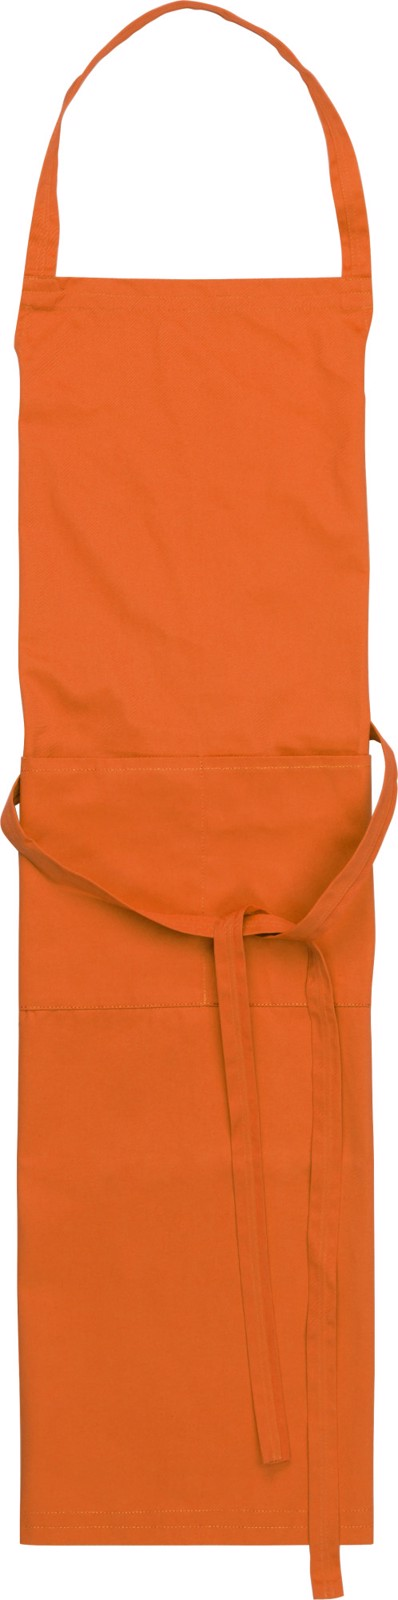 Cotton and polyester (240 gr/m²) apron - Orange